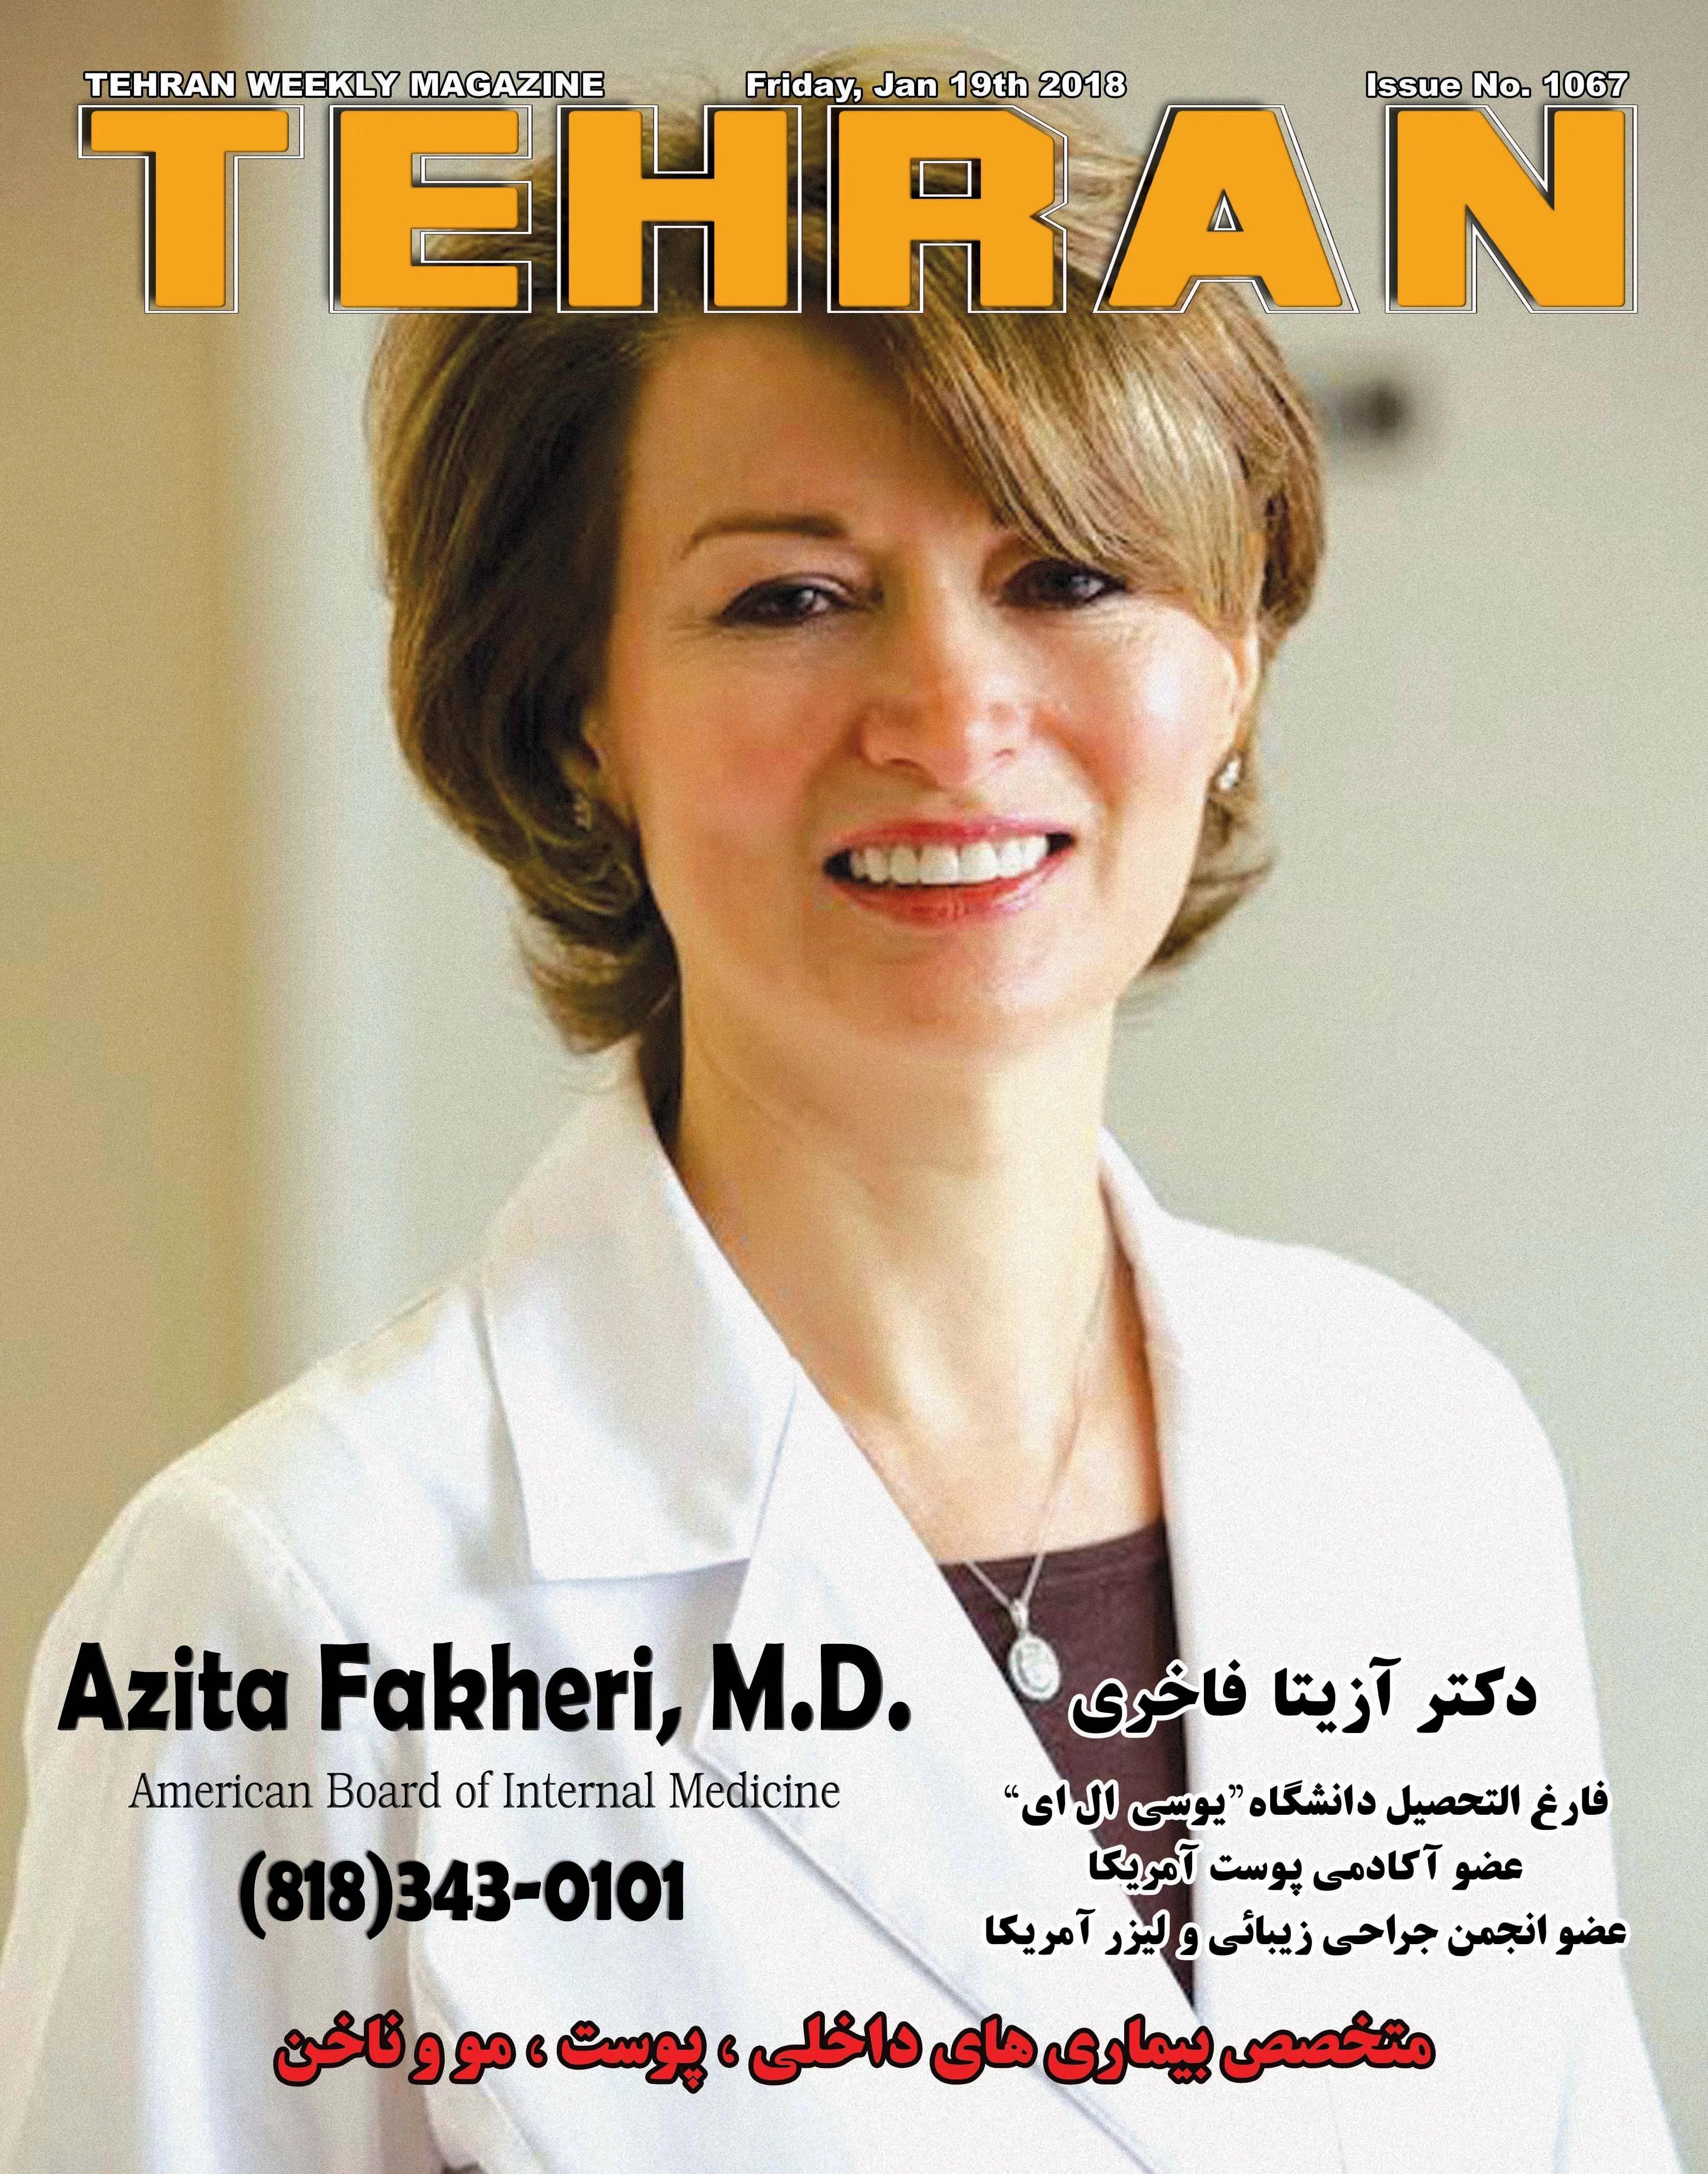 tehran-magazine-azita-fakheri